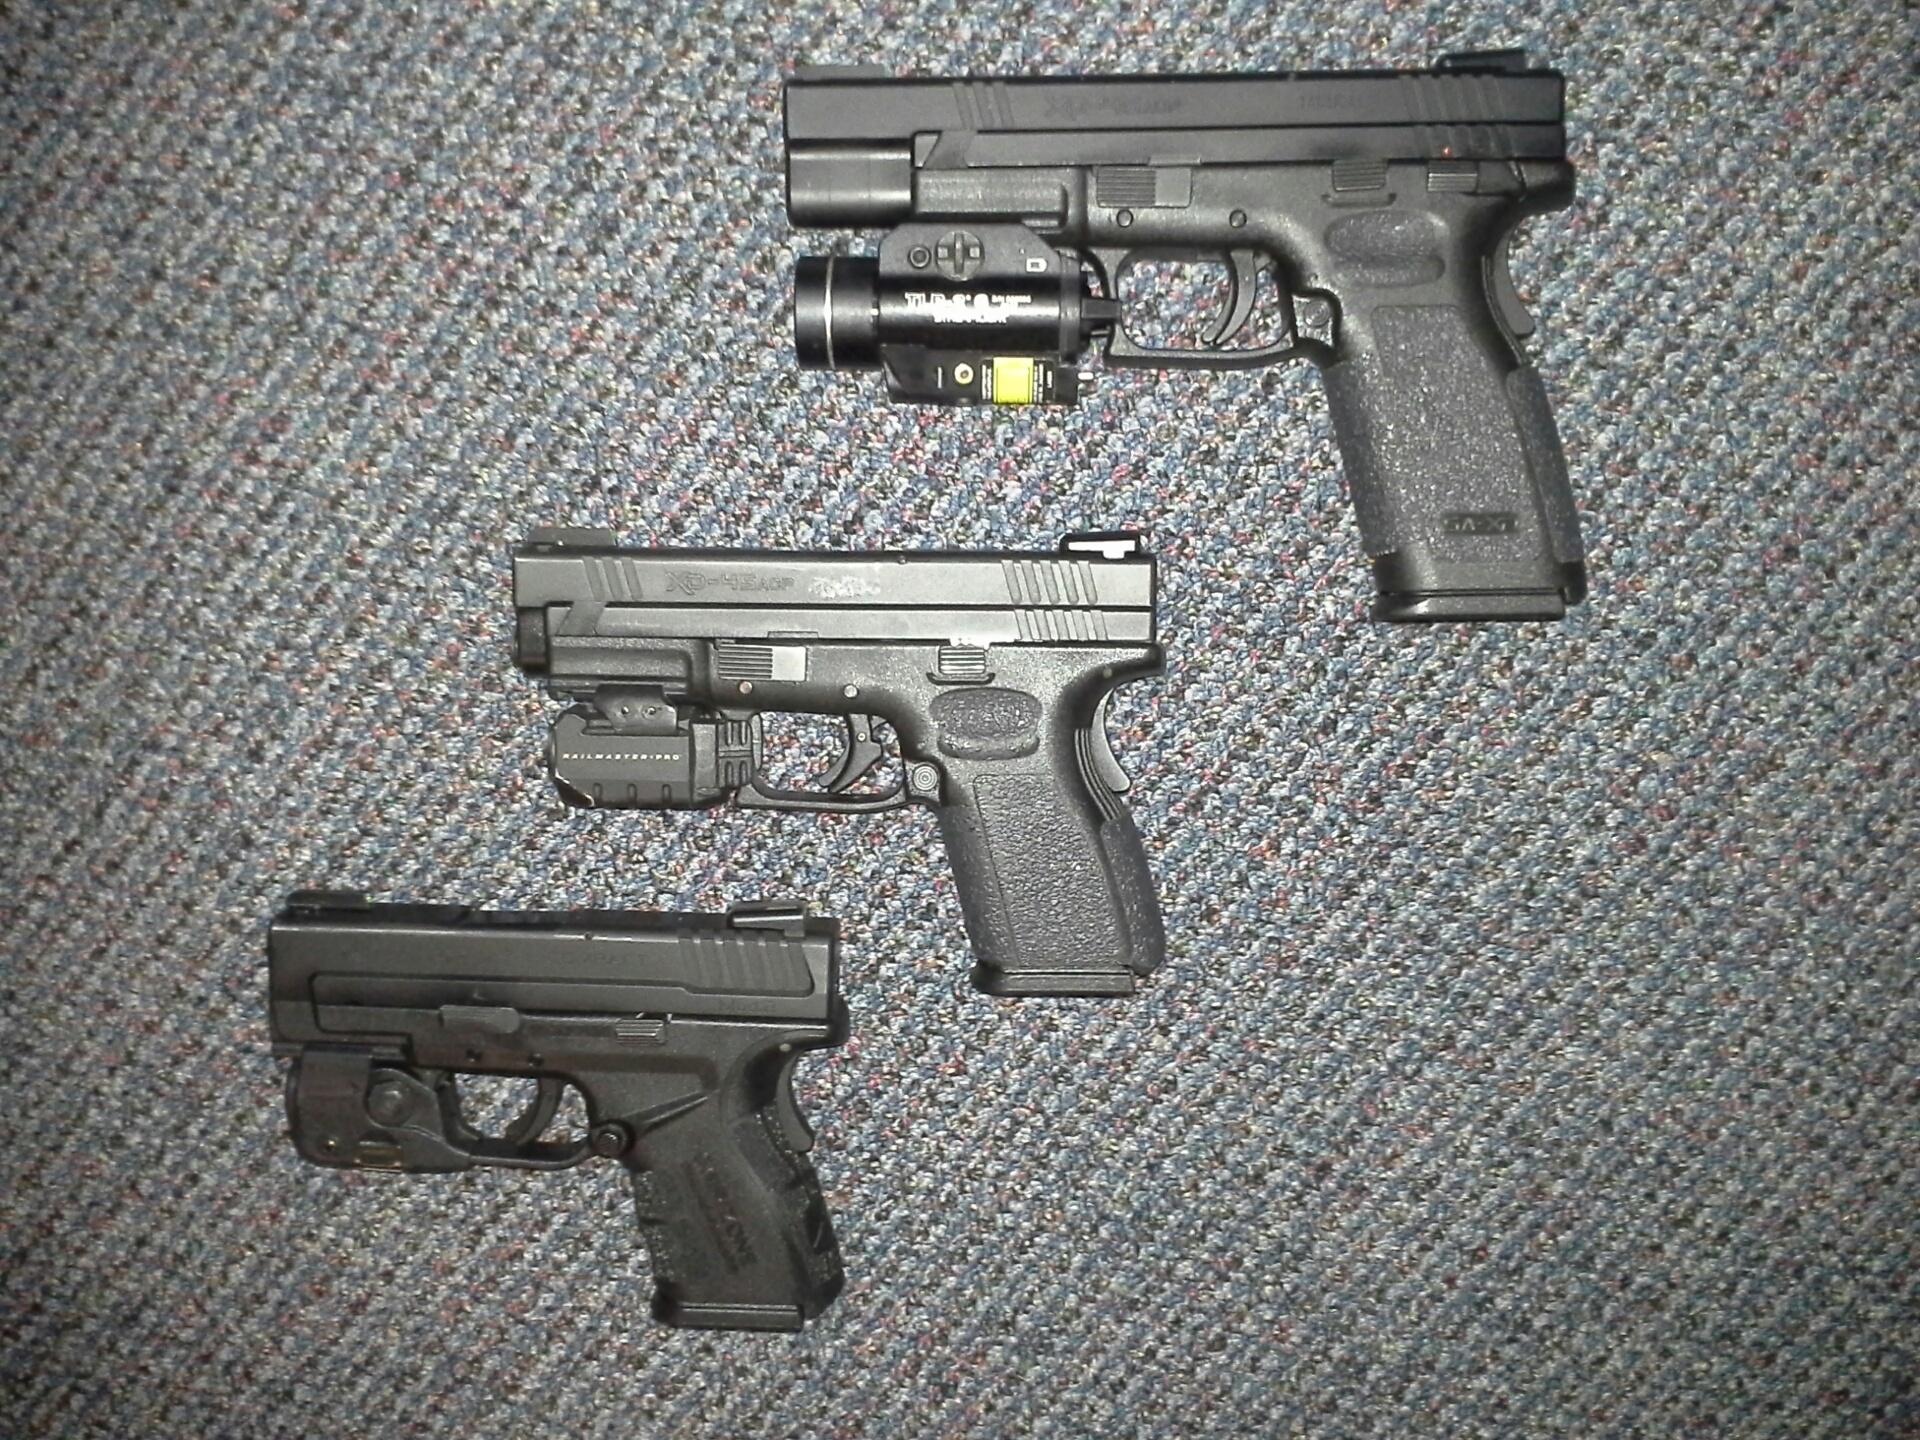 Mod 2 45 sub compact laser choice?   Springfield XD Forum